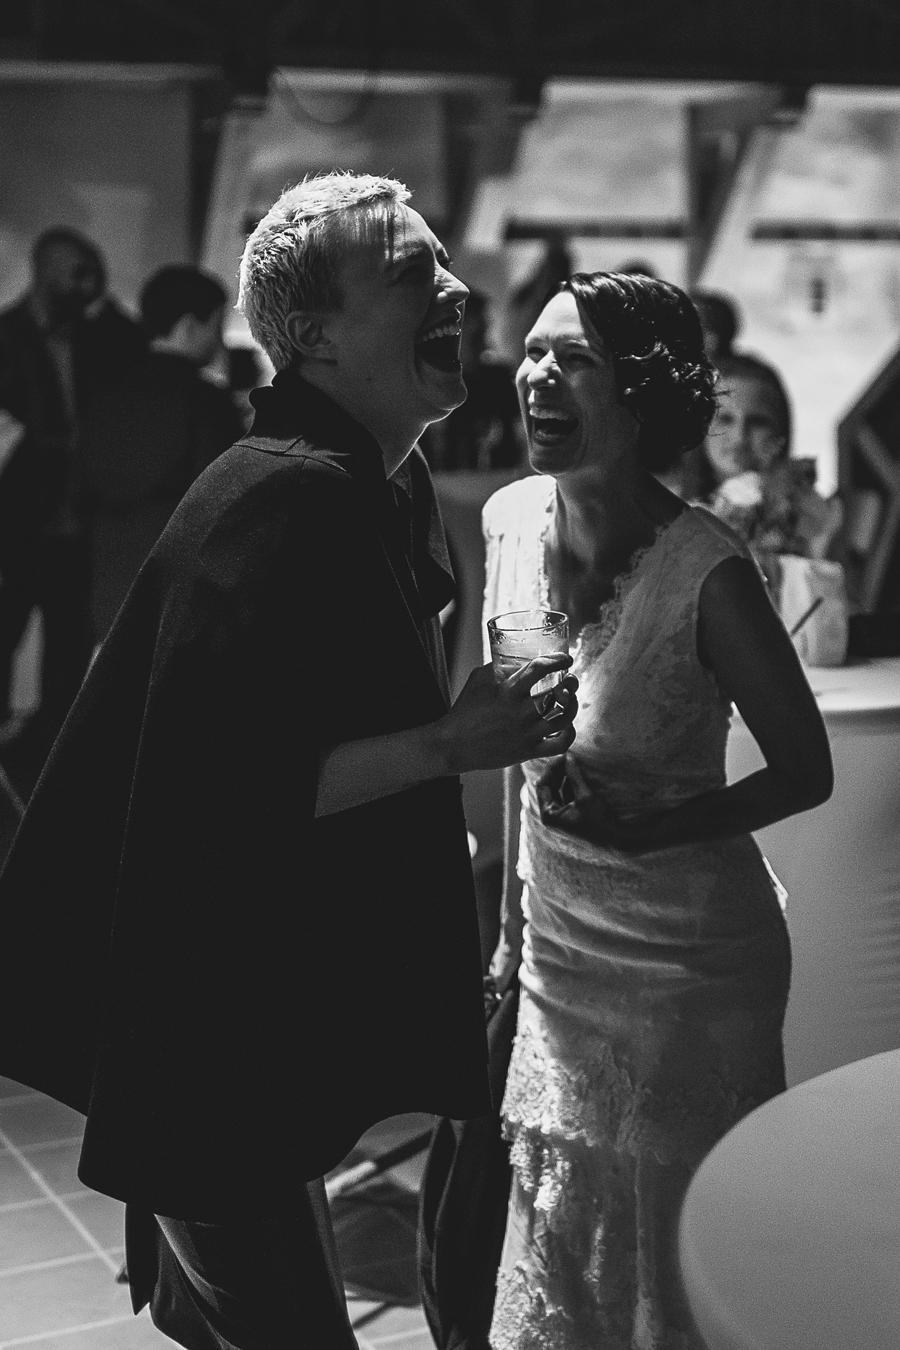 kranj_layer_poroka_wedding_photography_hochzeit01651.jpg